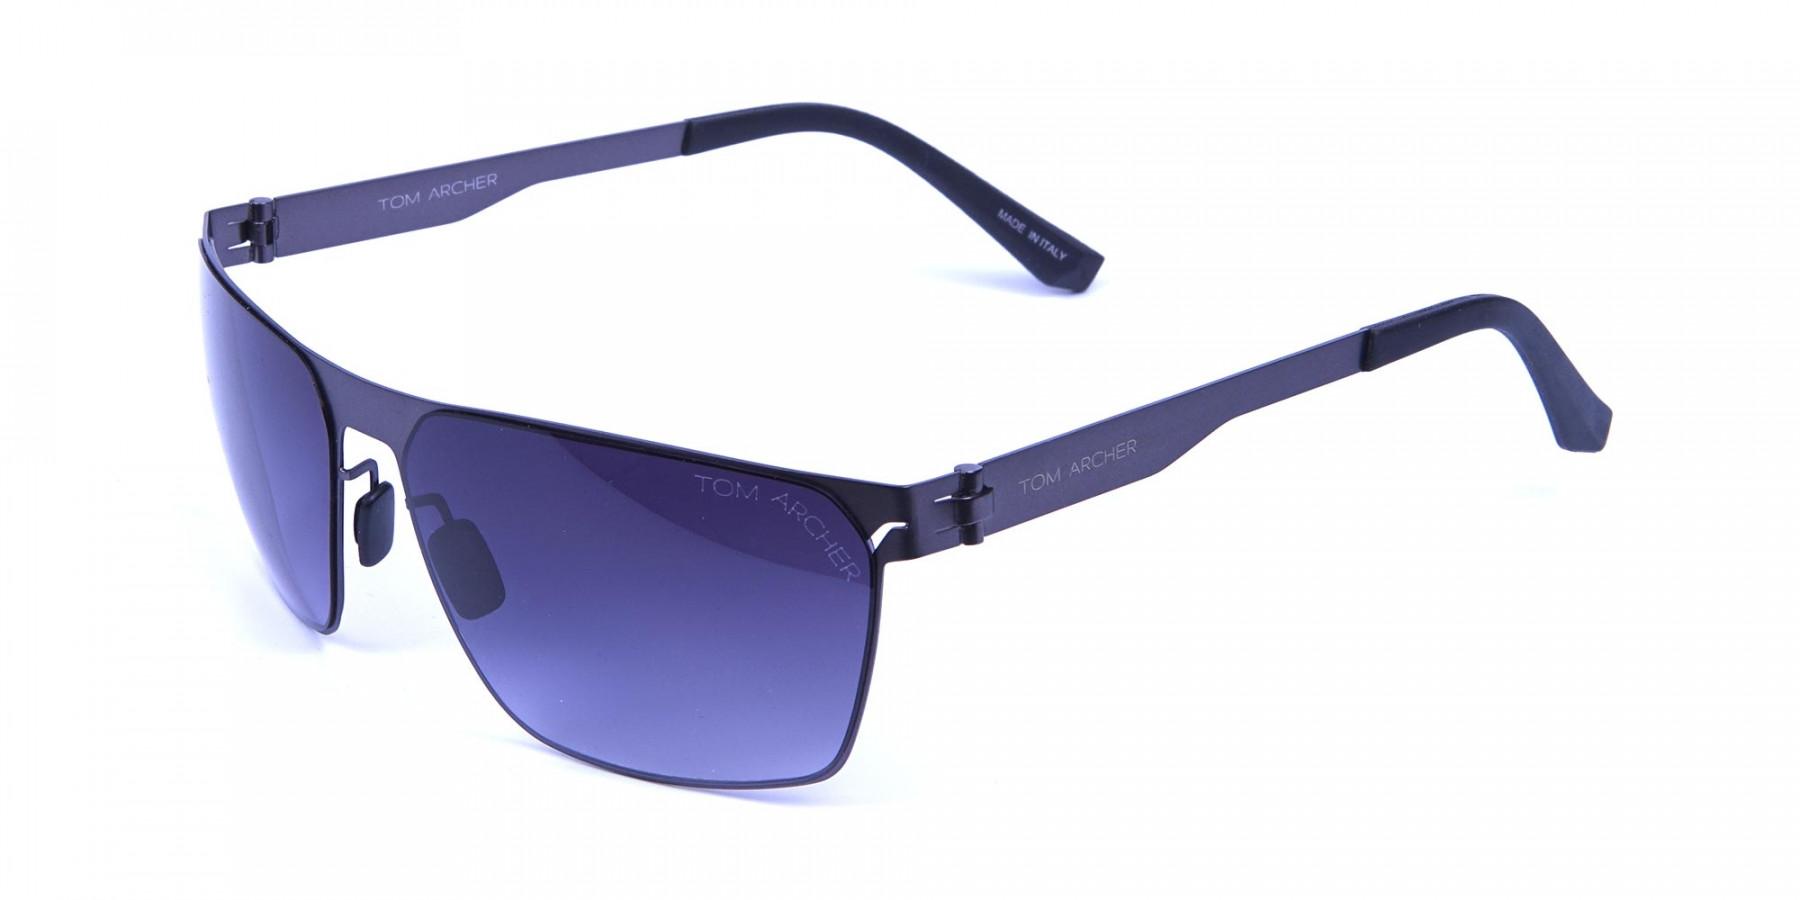 Smoky Gunmetal Rectangular Sunglasses -2